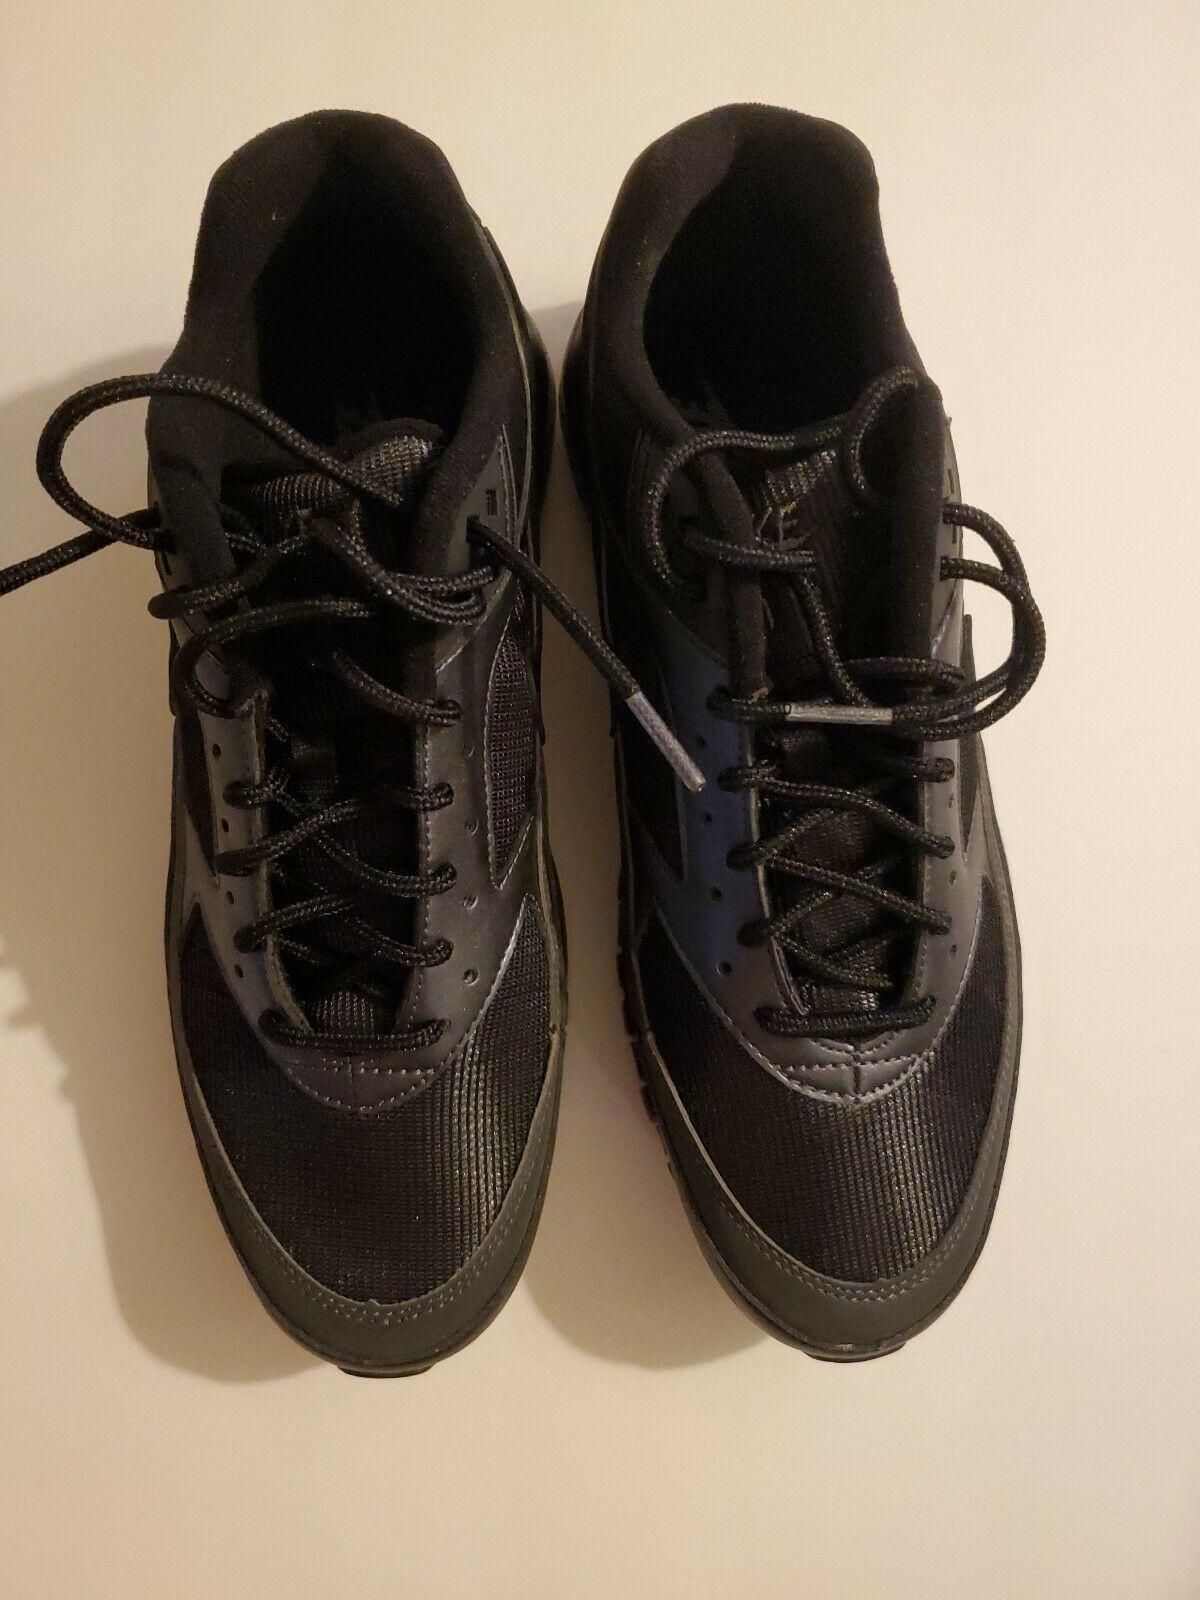 Nike Air Max 97/BW Running Shoes Black Metallic Hematite Men's Sz 7 AO2406-001 image 3